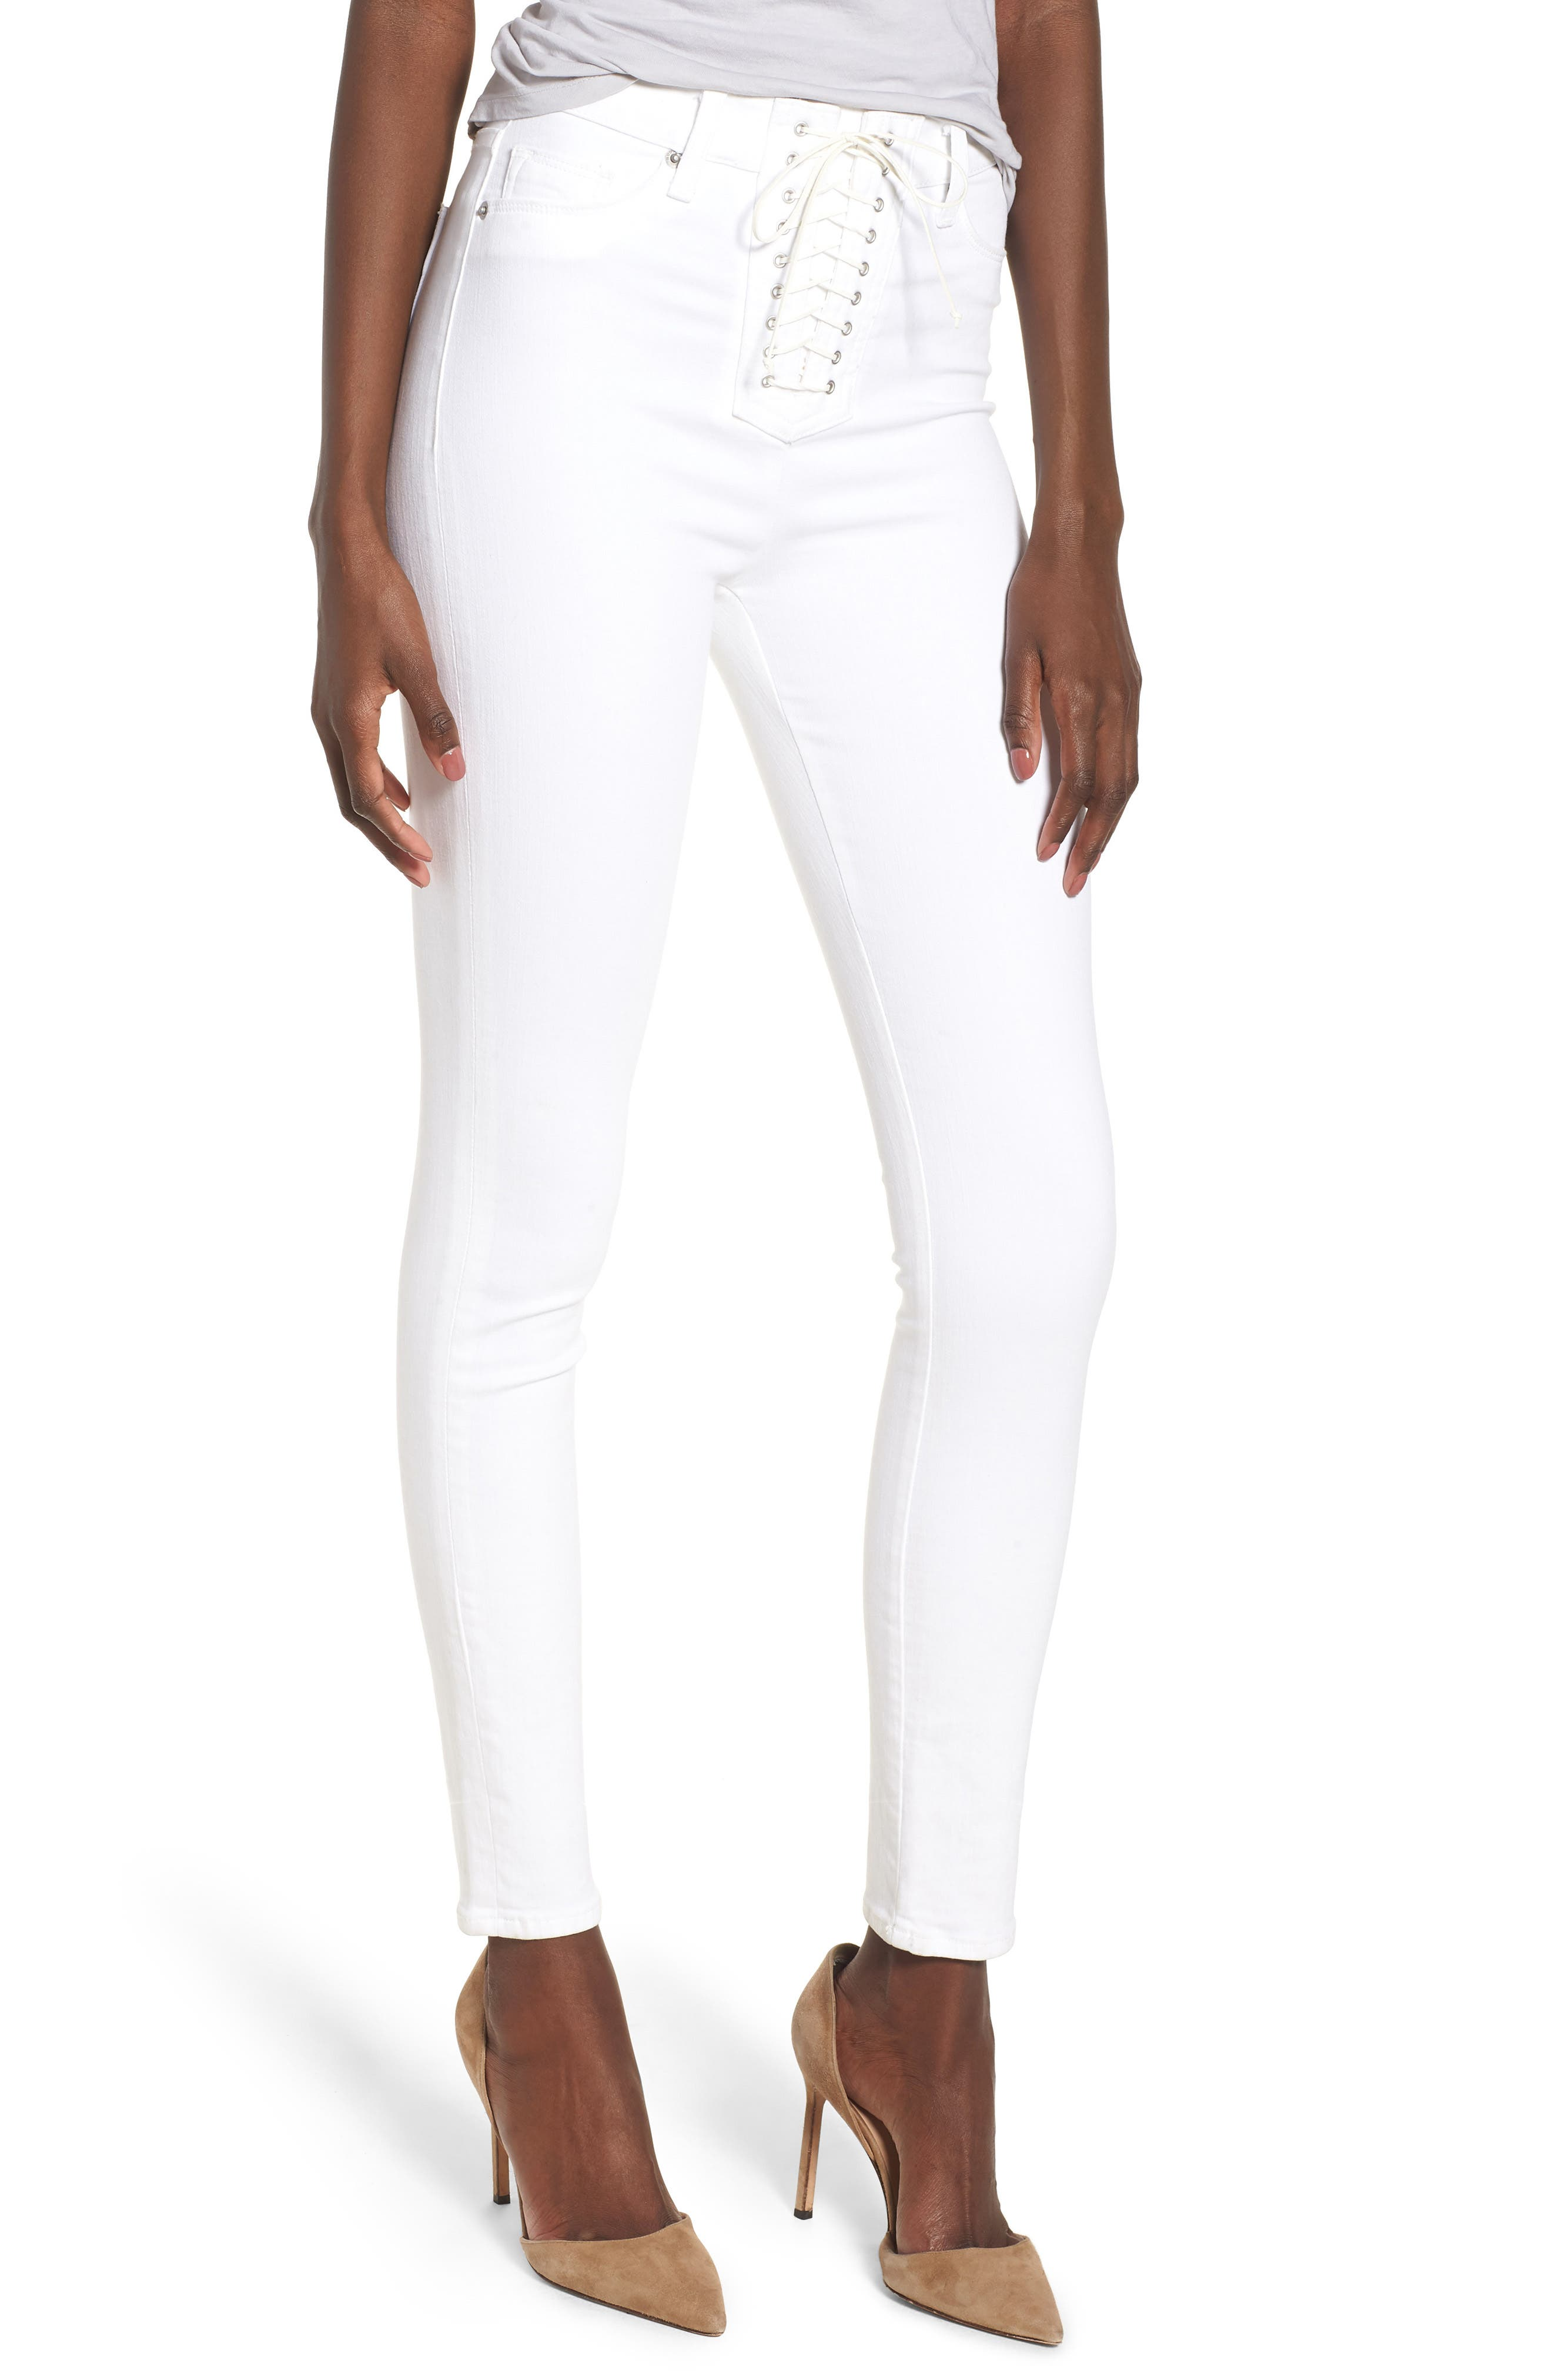 HUDSON JEANS Bullocks Lace-Up High Waist Super Skinny Jeans, Main, color, 110